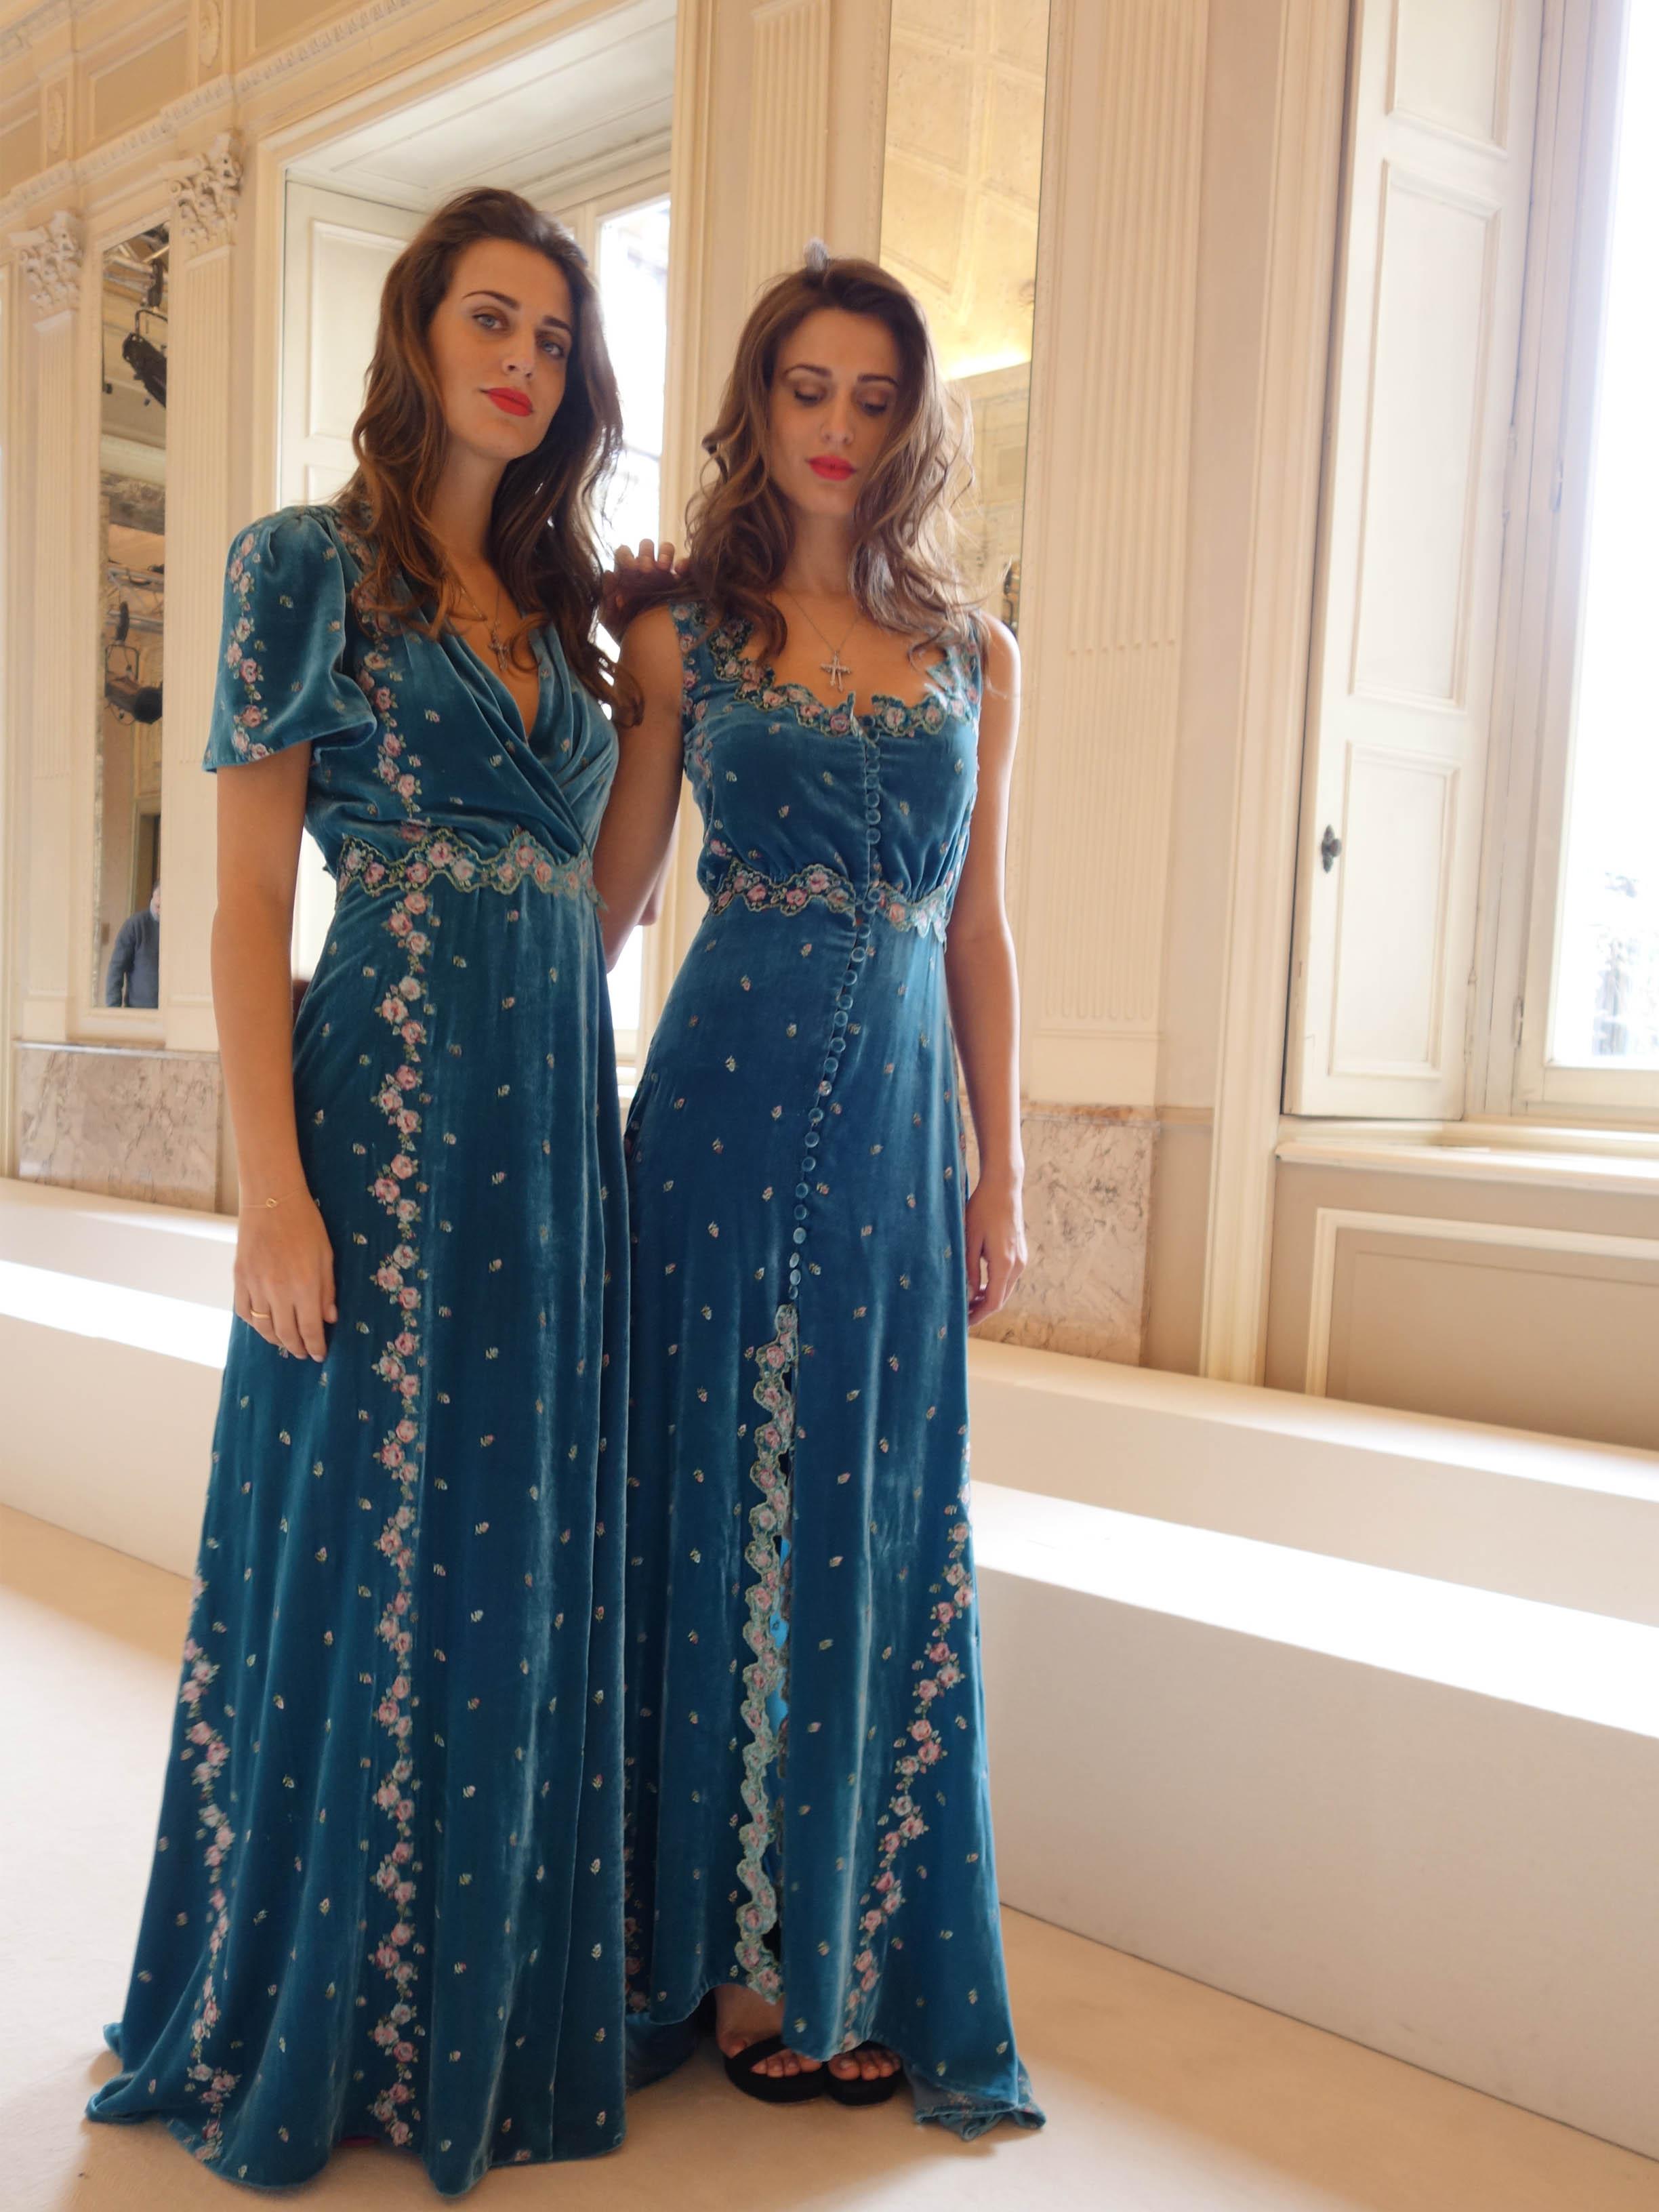 At the neoclassical Palazzo Bovara | Luisa Beccaria Show